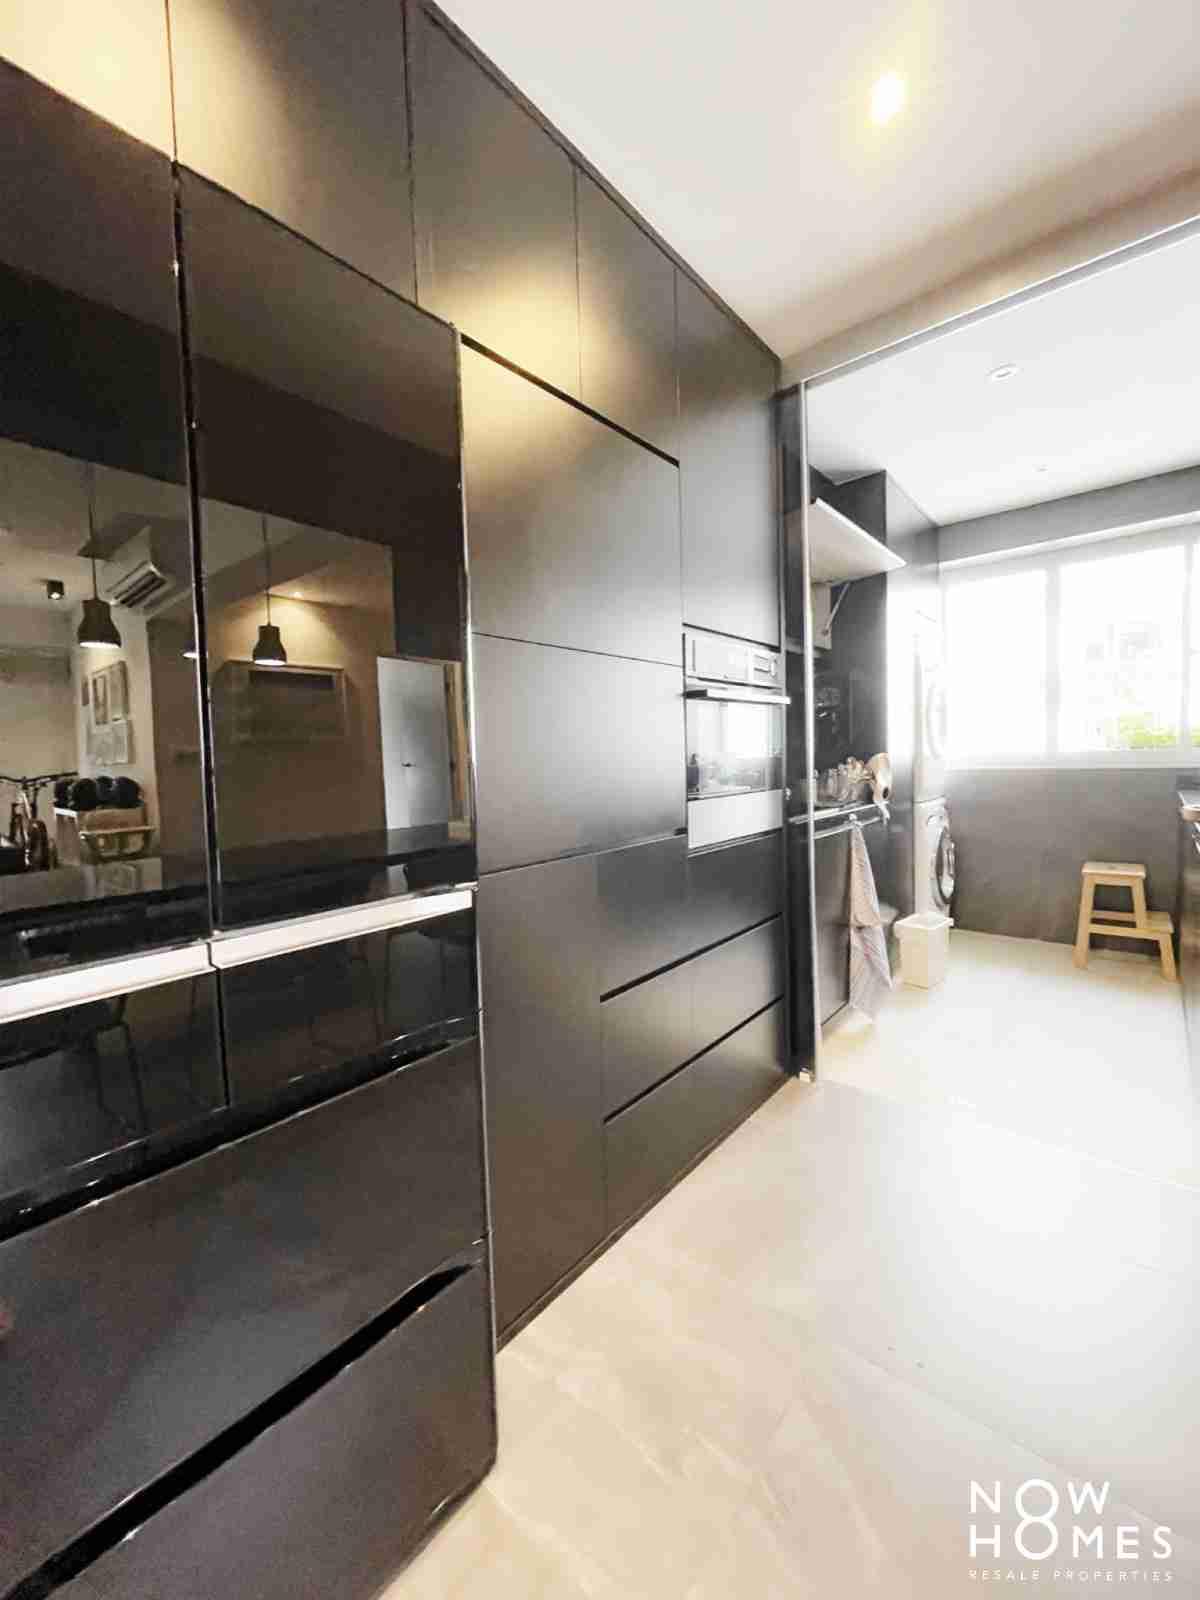 sengkang resale property - 288 compassvale - Kitchen